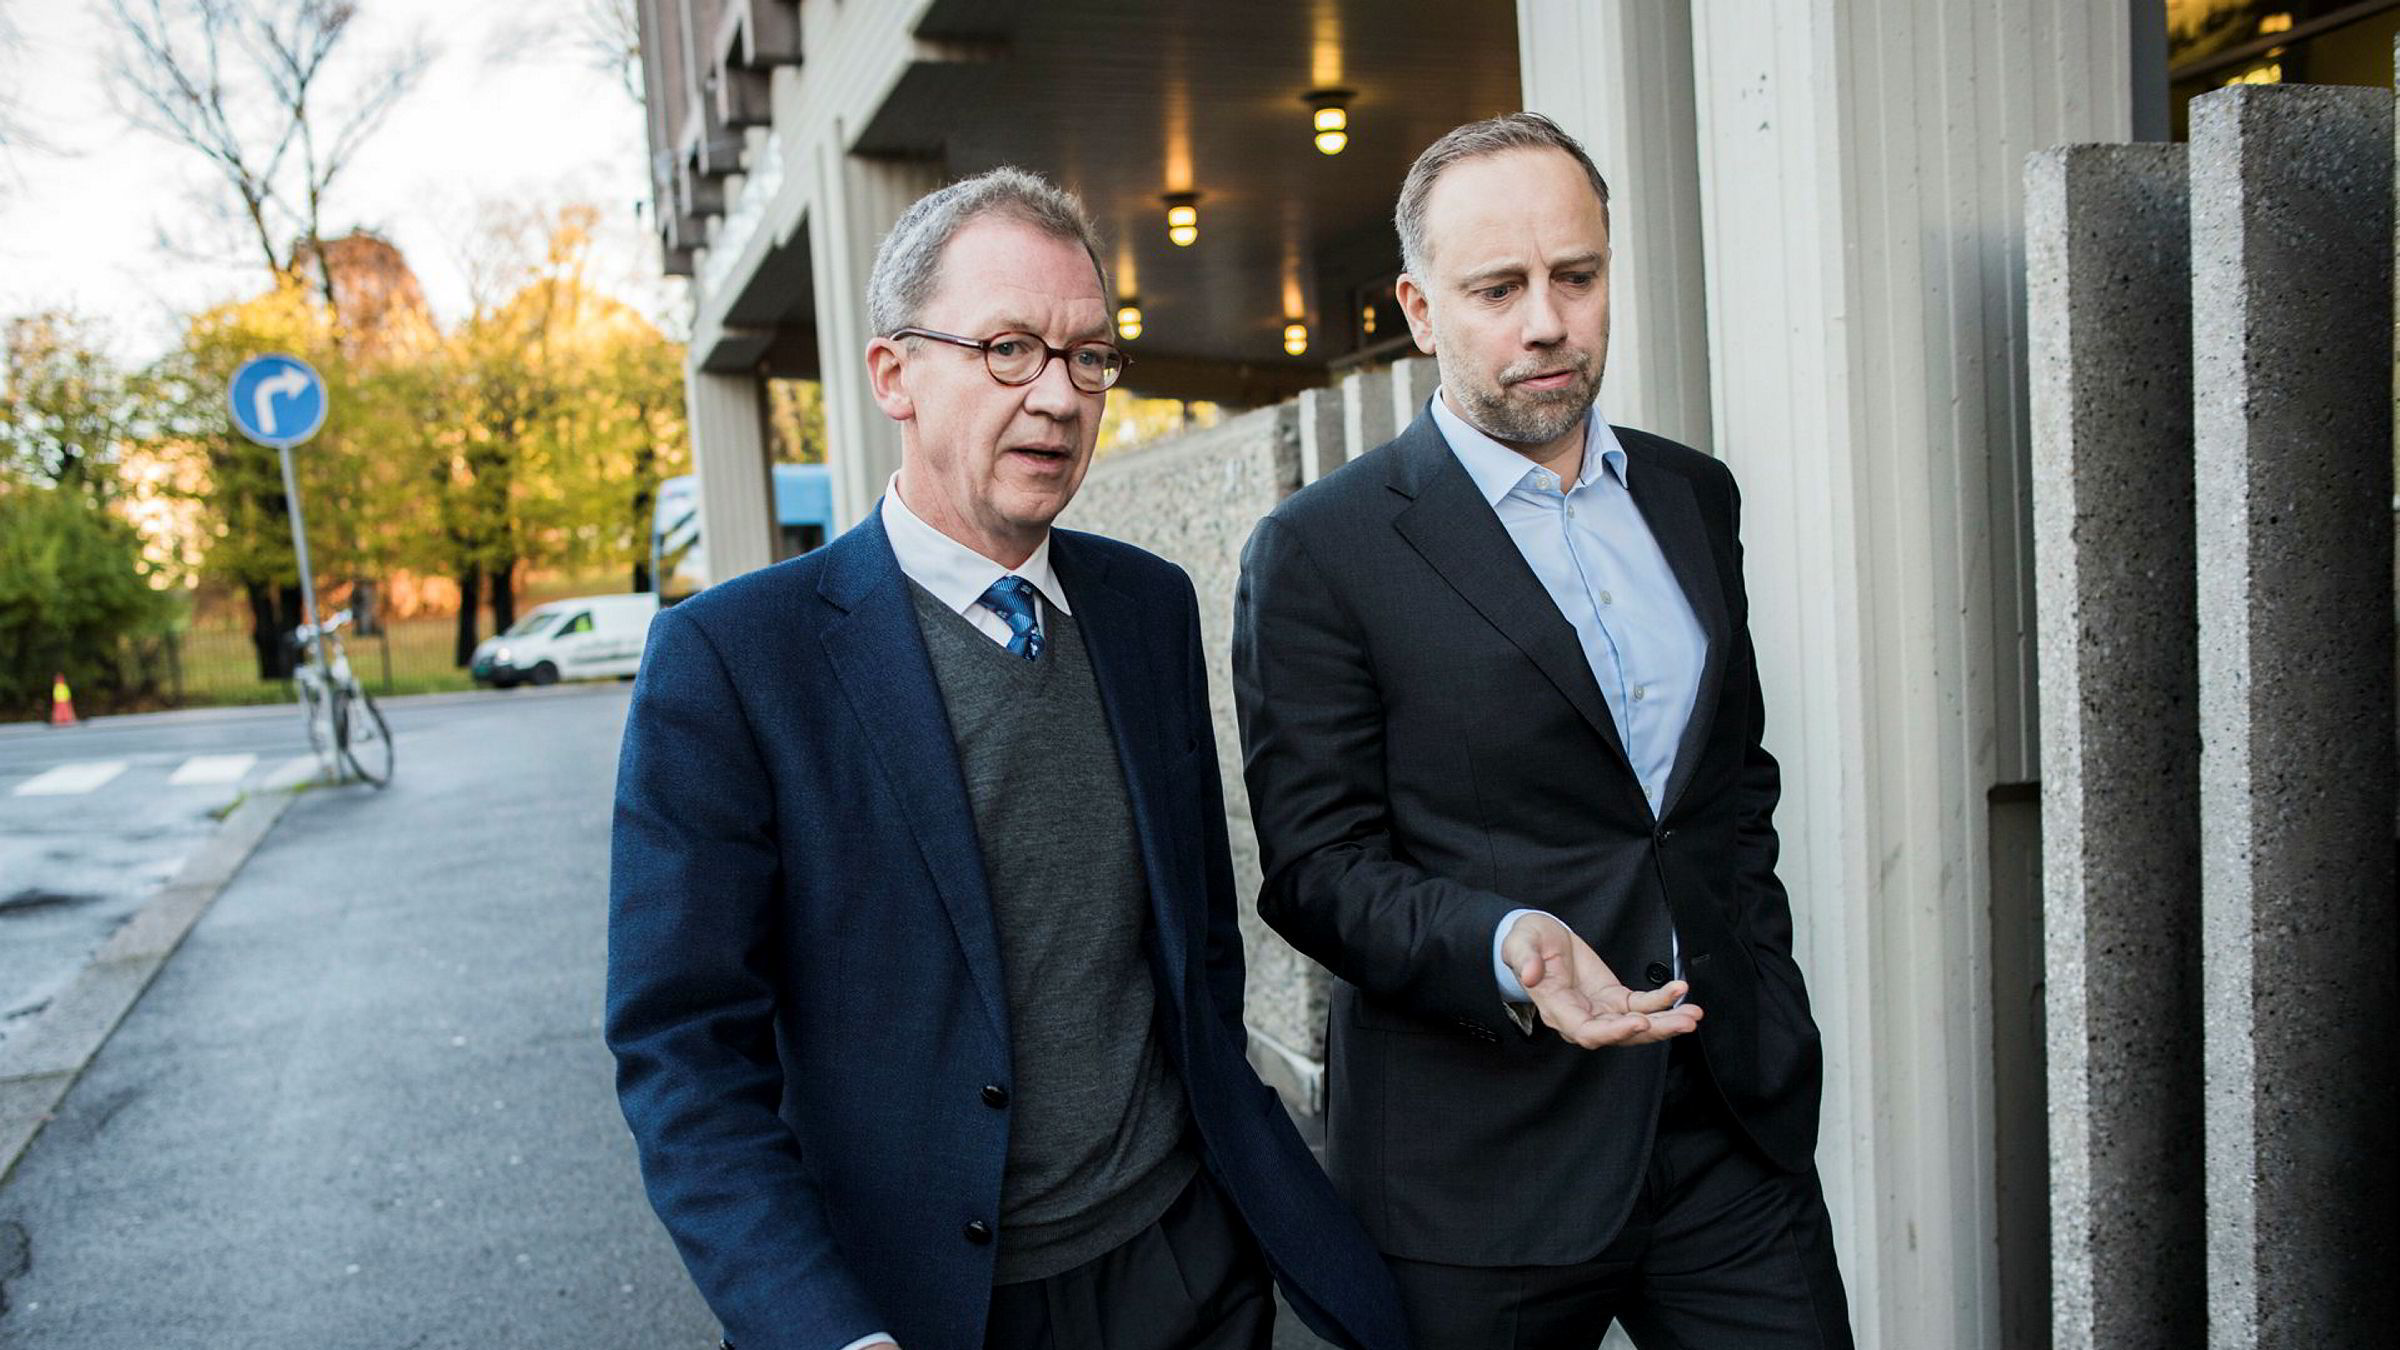 Finans Norge-sjef Idar Kreutzer (til venstre) og sjef i Eiendom Norge Christian Dreyer påpeker at småleiligheter i Oslo fungerer som en ledende indikator for hele boligmarkedet.